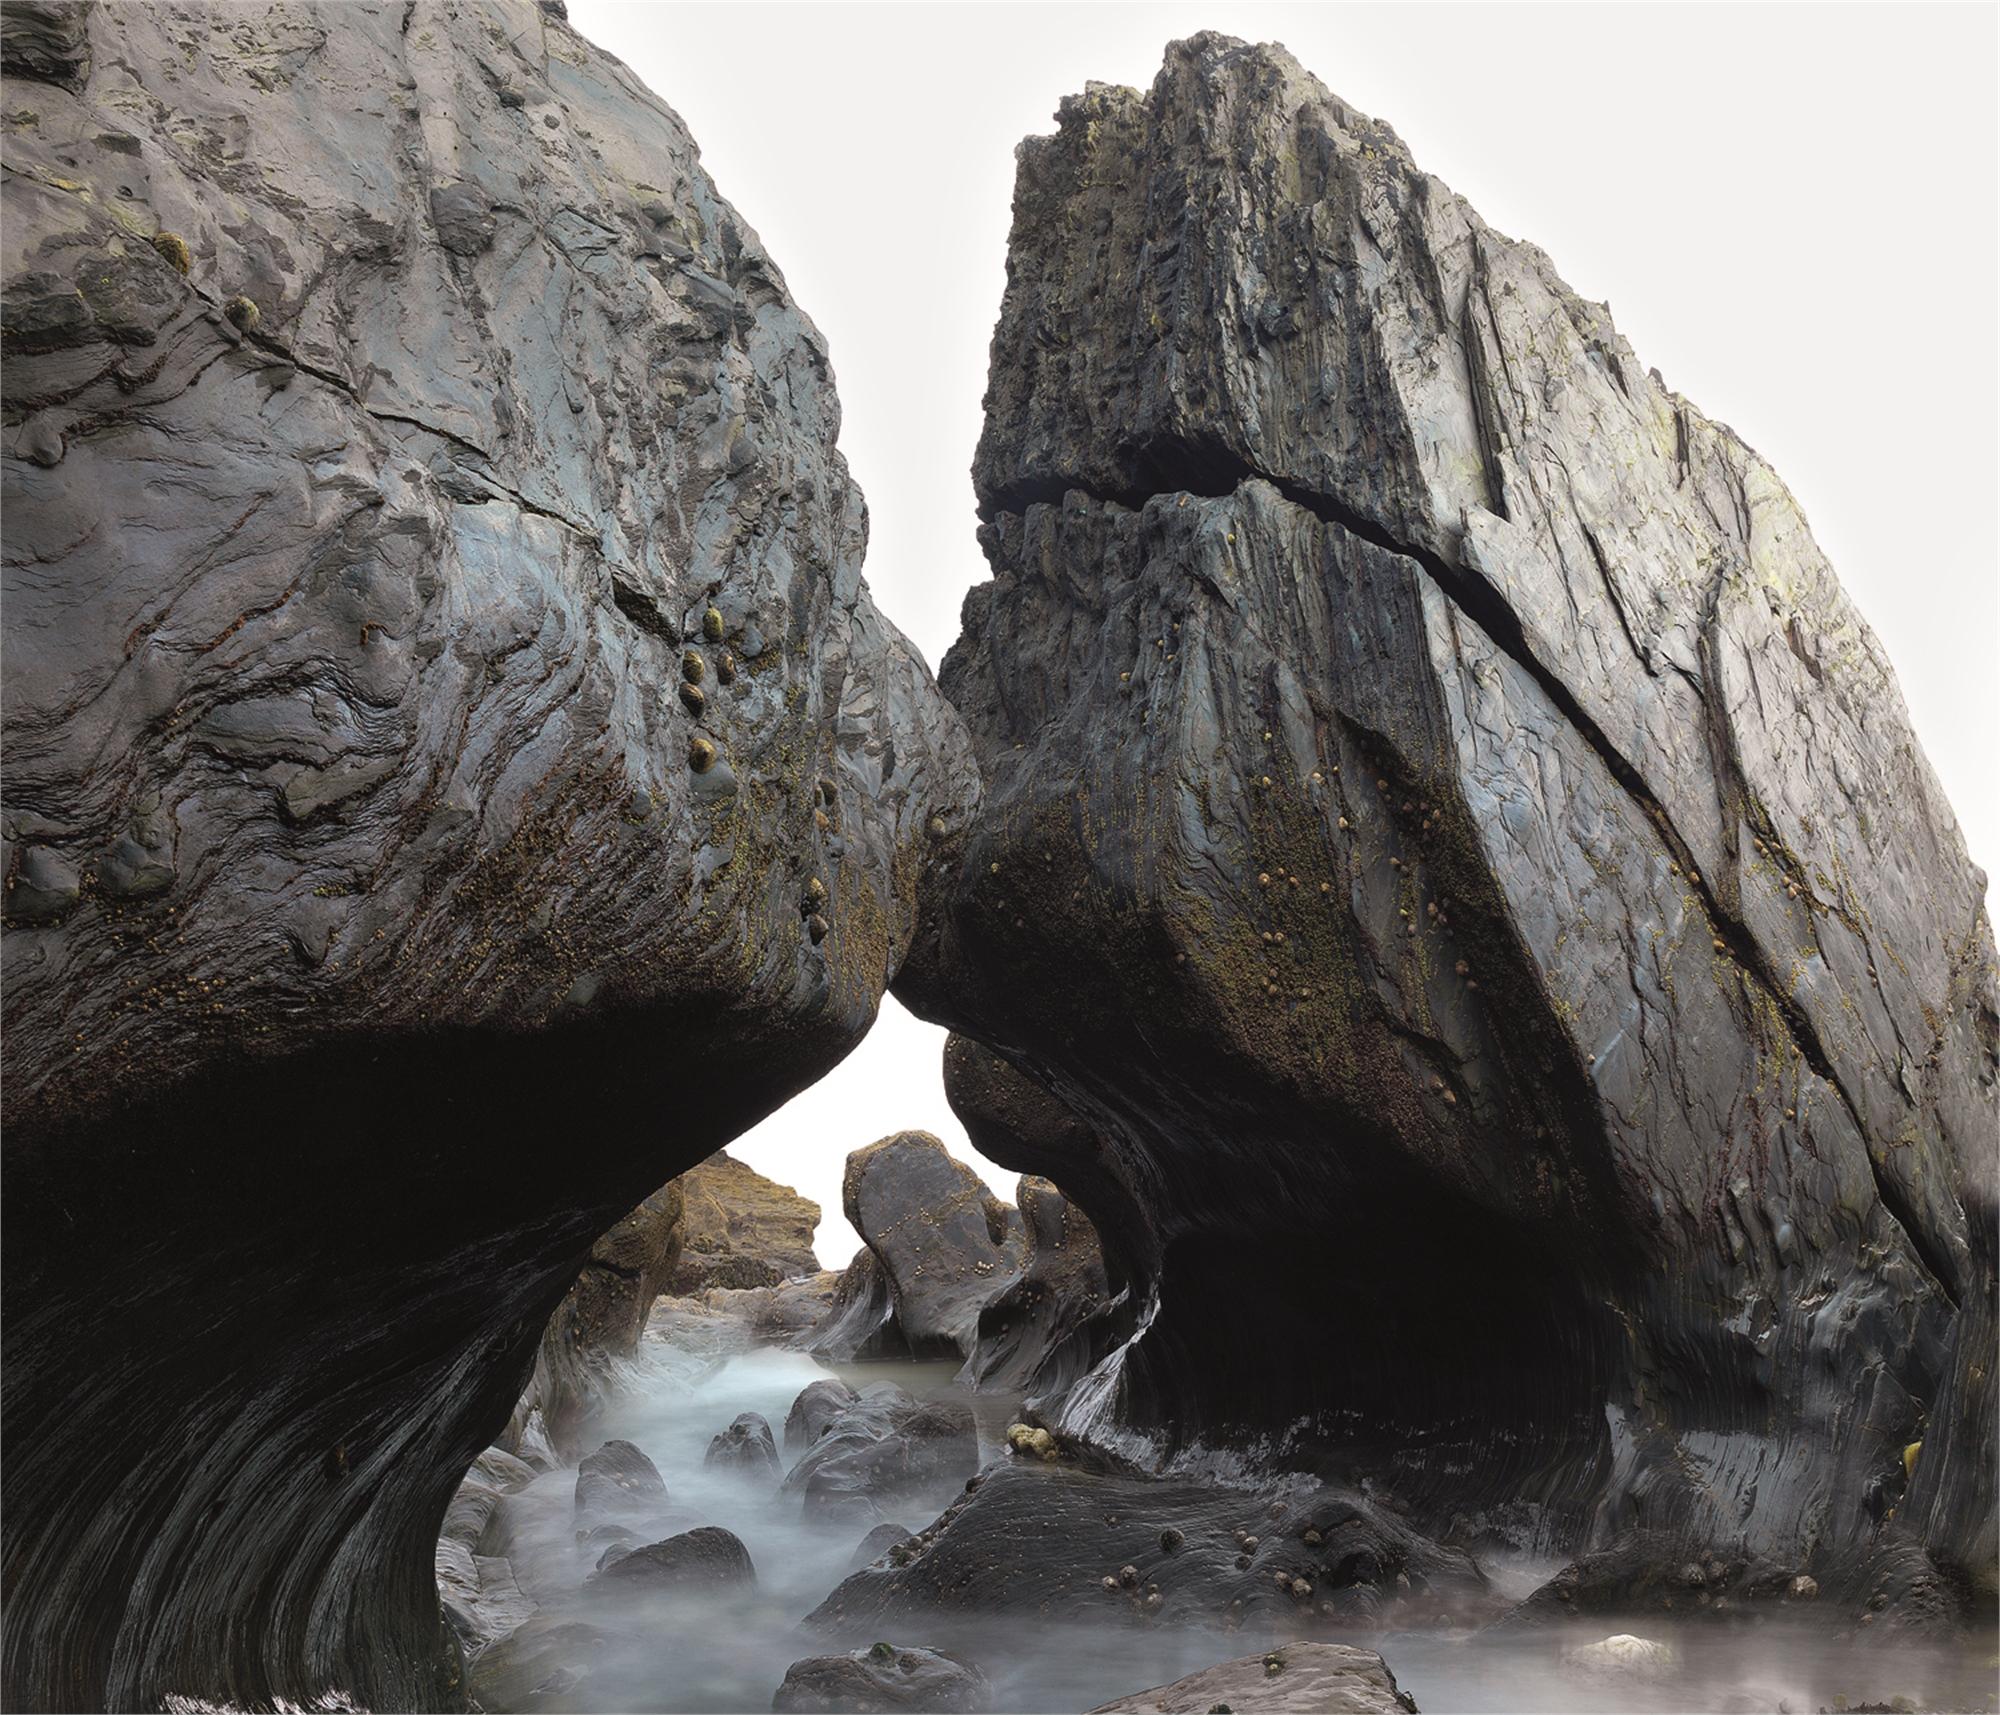 Rocksavage Study #1, South Ring, West Cork, Ireland by David Magee